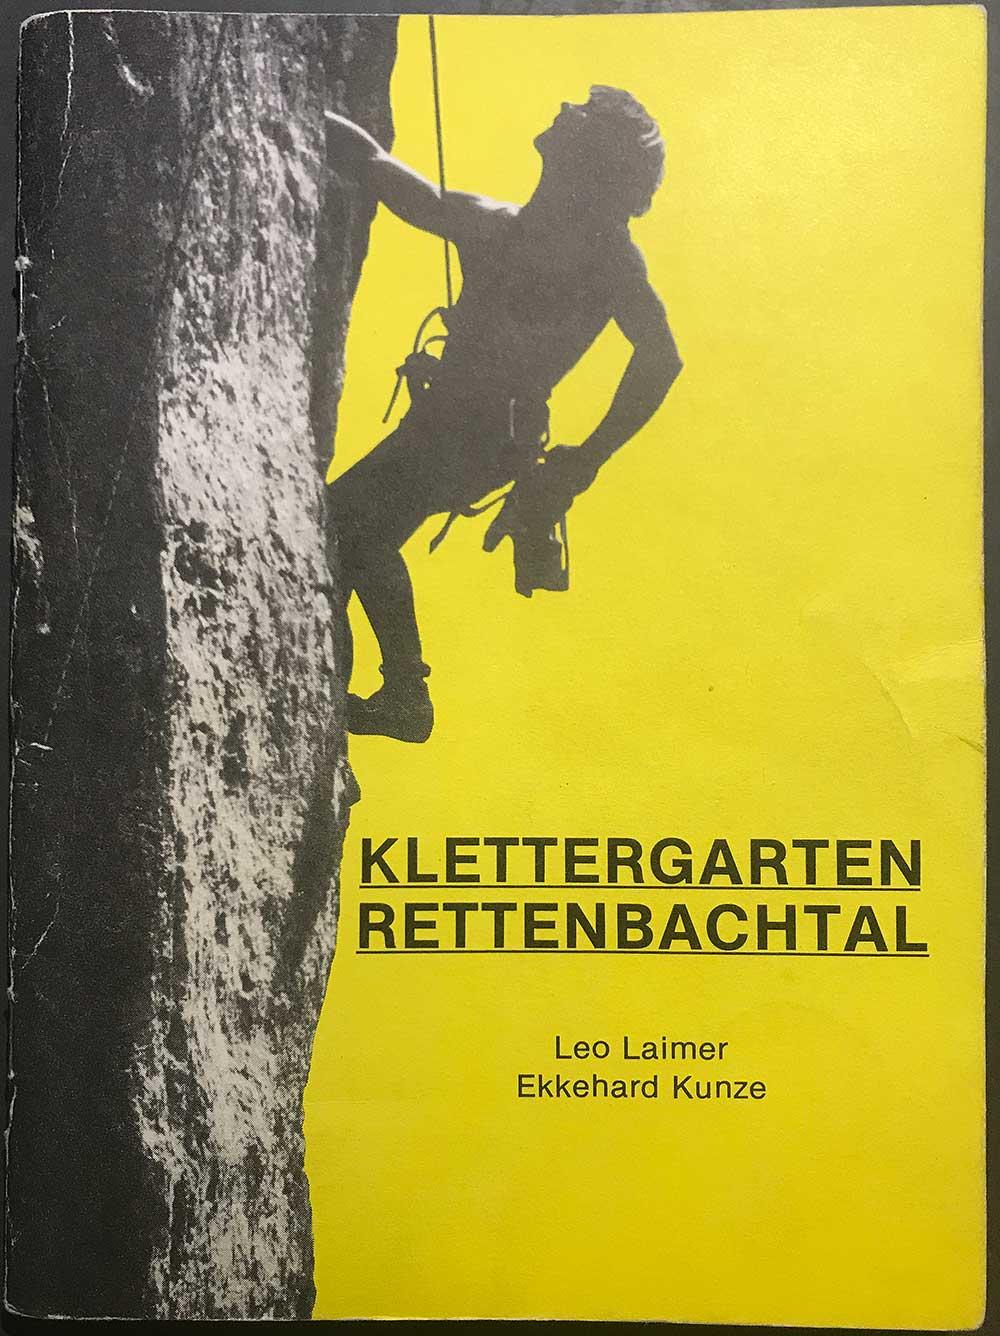 Průvodce Klettergatren Rettenbachtal